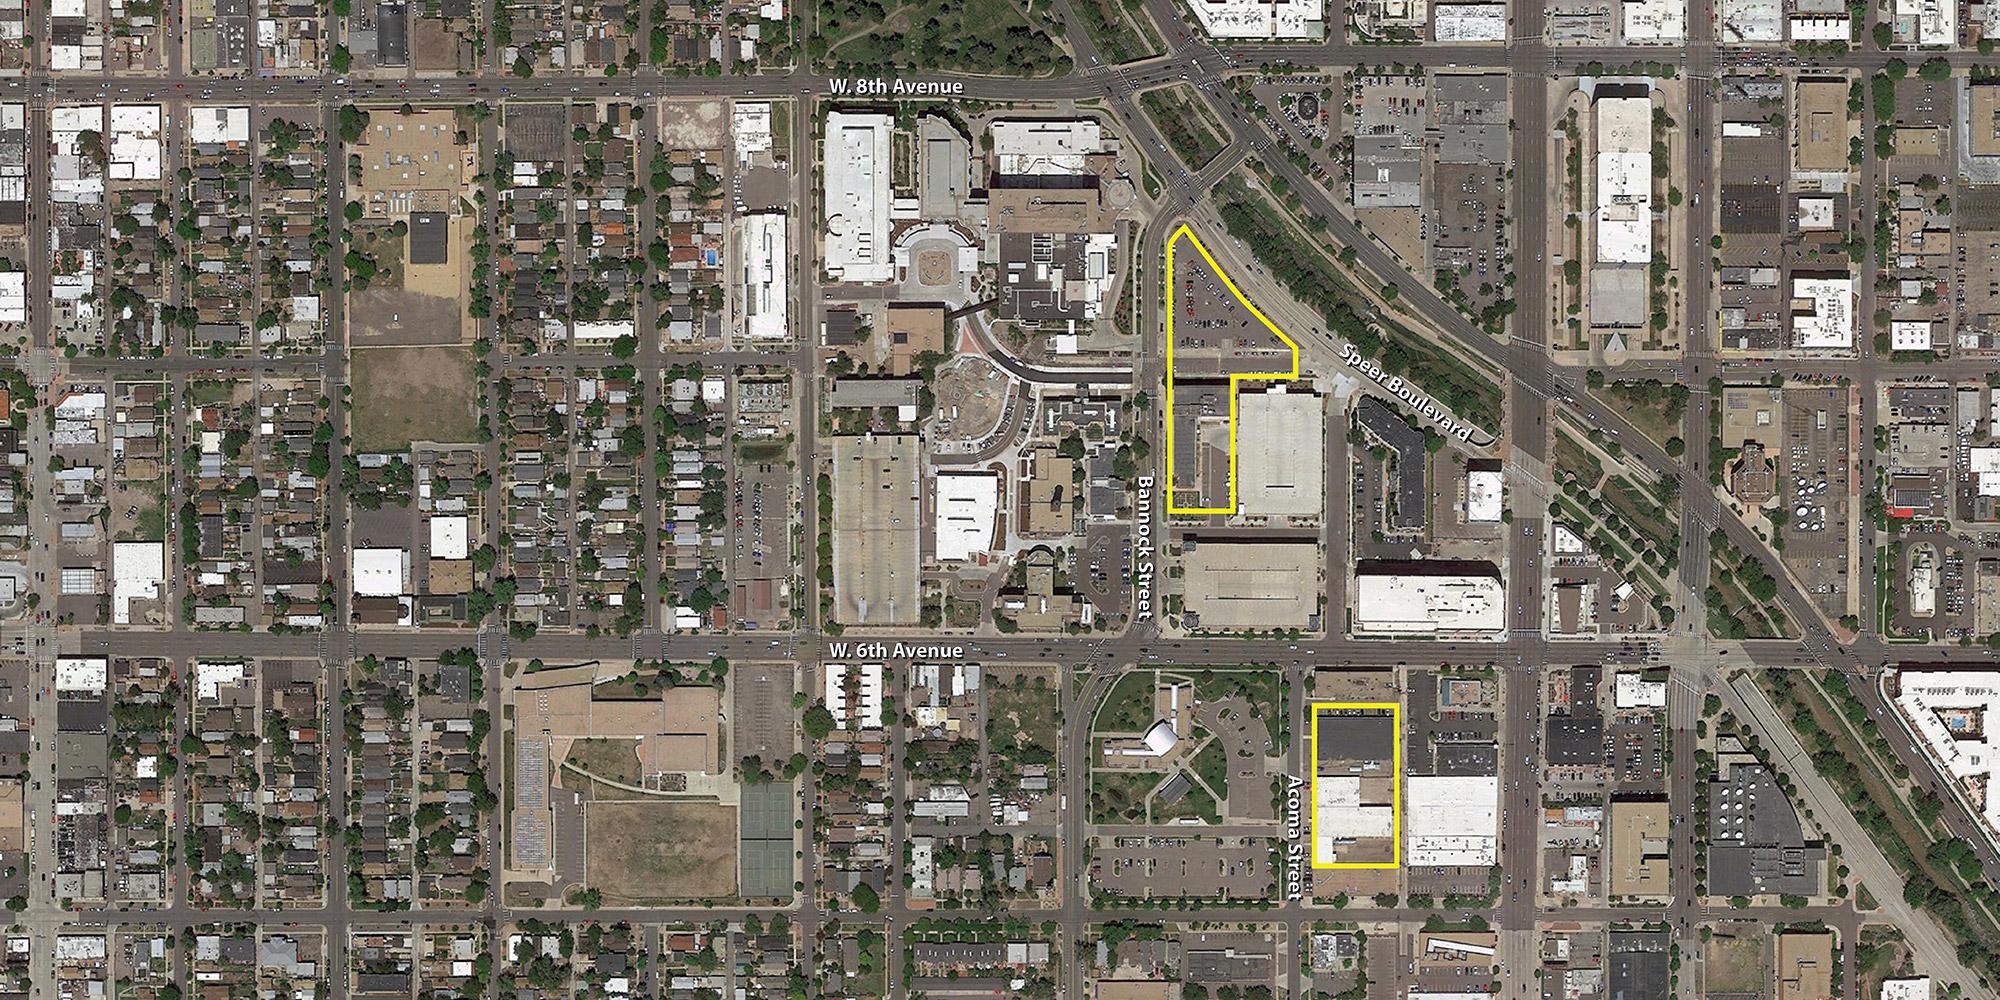 New Denver Health Outpatient Center and parking garage sites outlined on Google Earth aerial